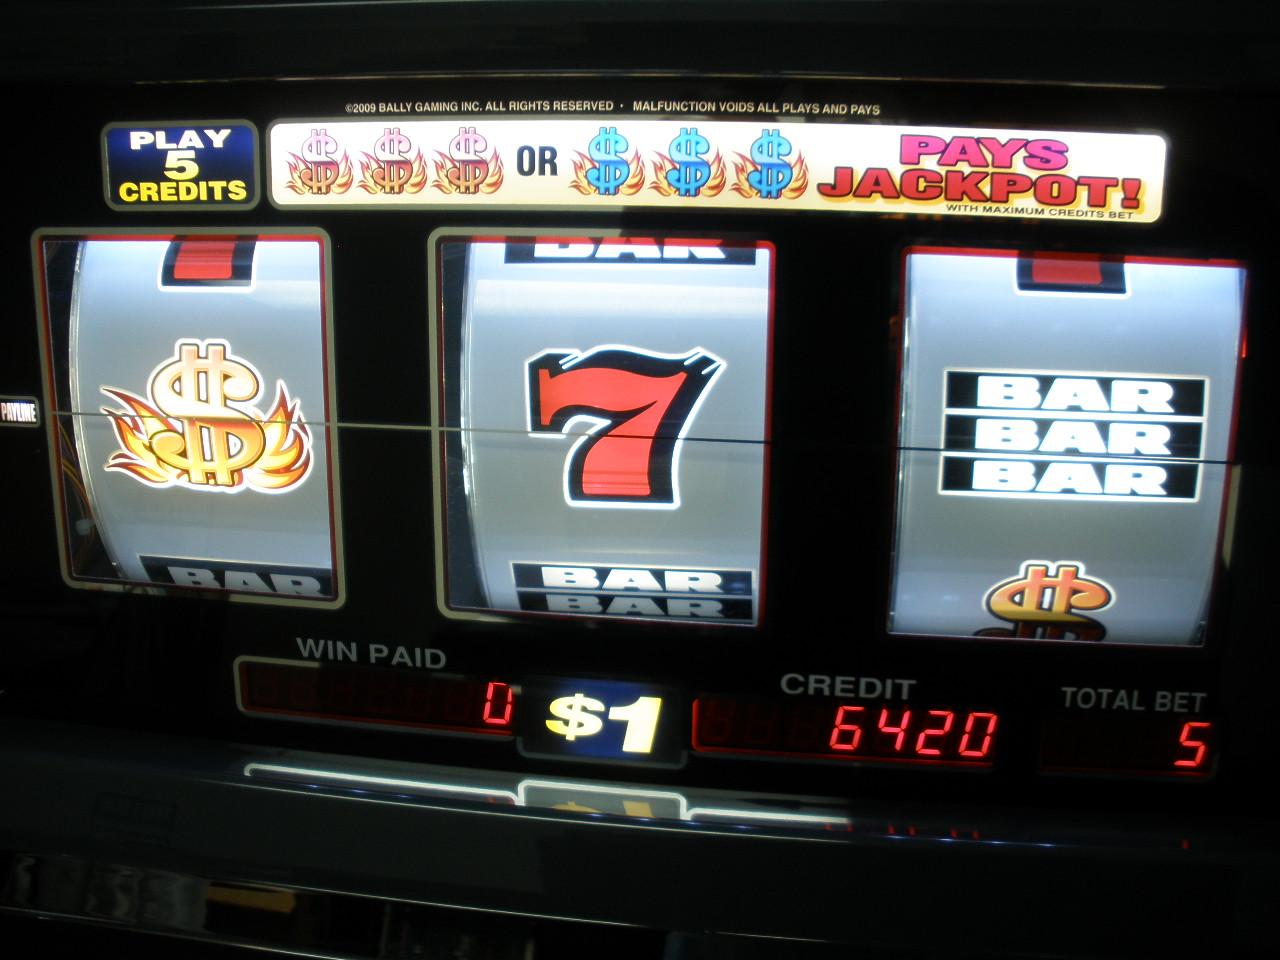 bally blazing 7 s dollars progressive s9000 slot machine with top